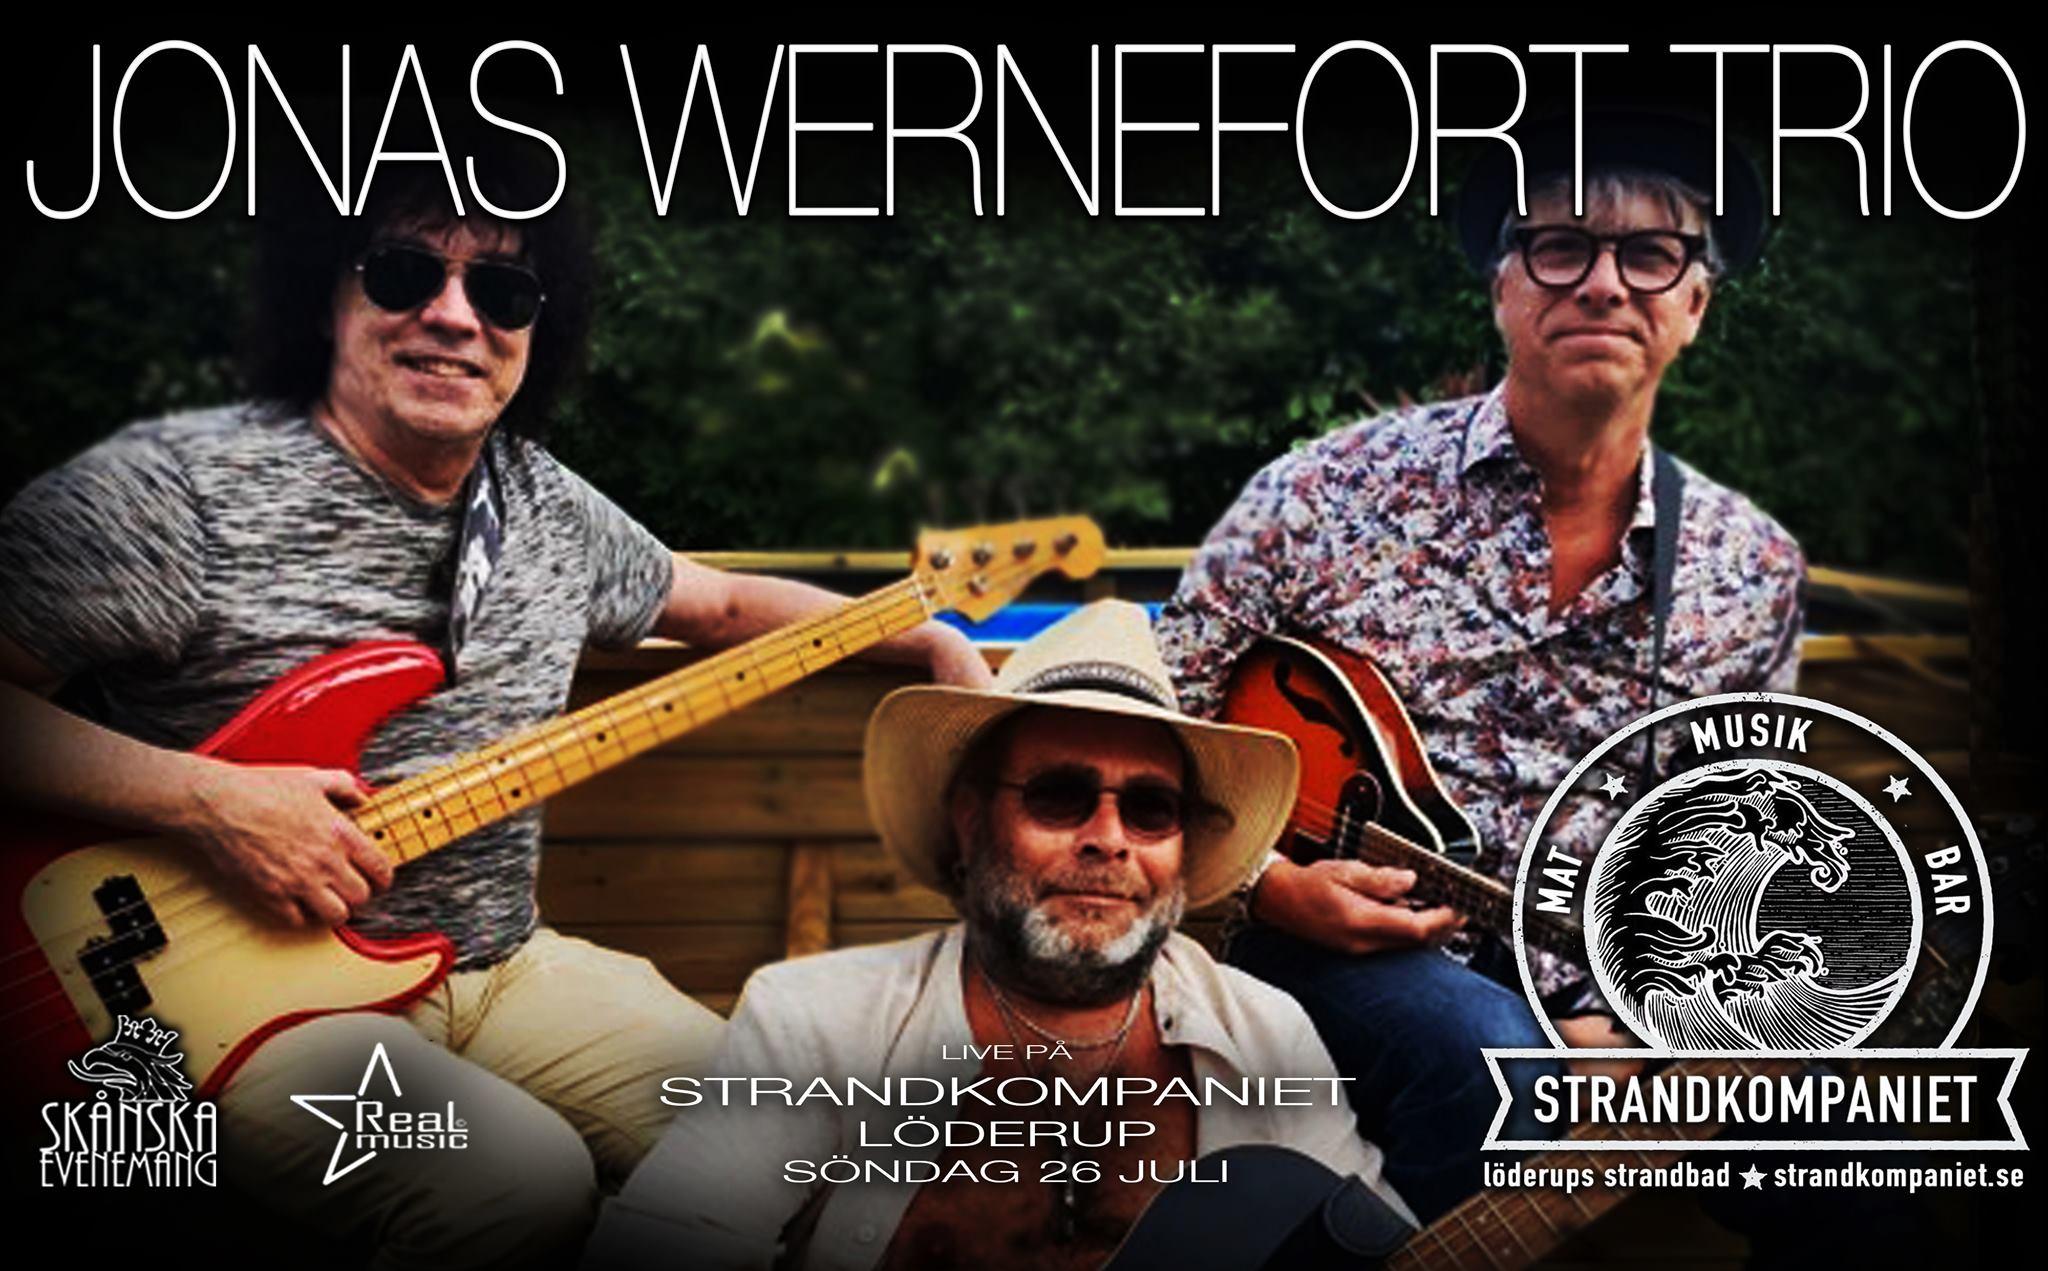 Jonas Wernefort Trio pa Strandkompaniet österlen.se